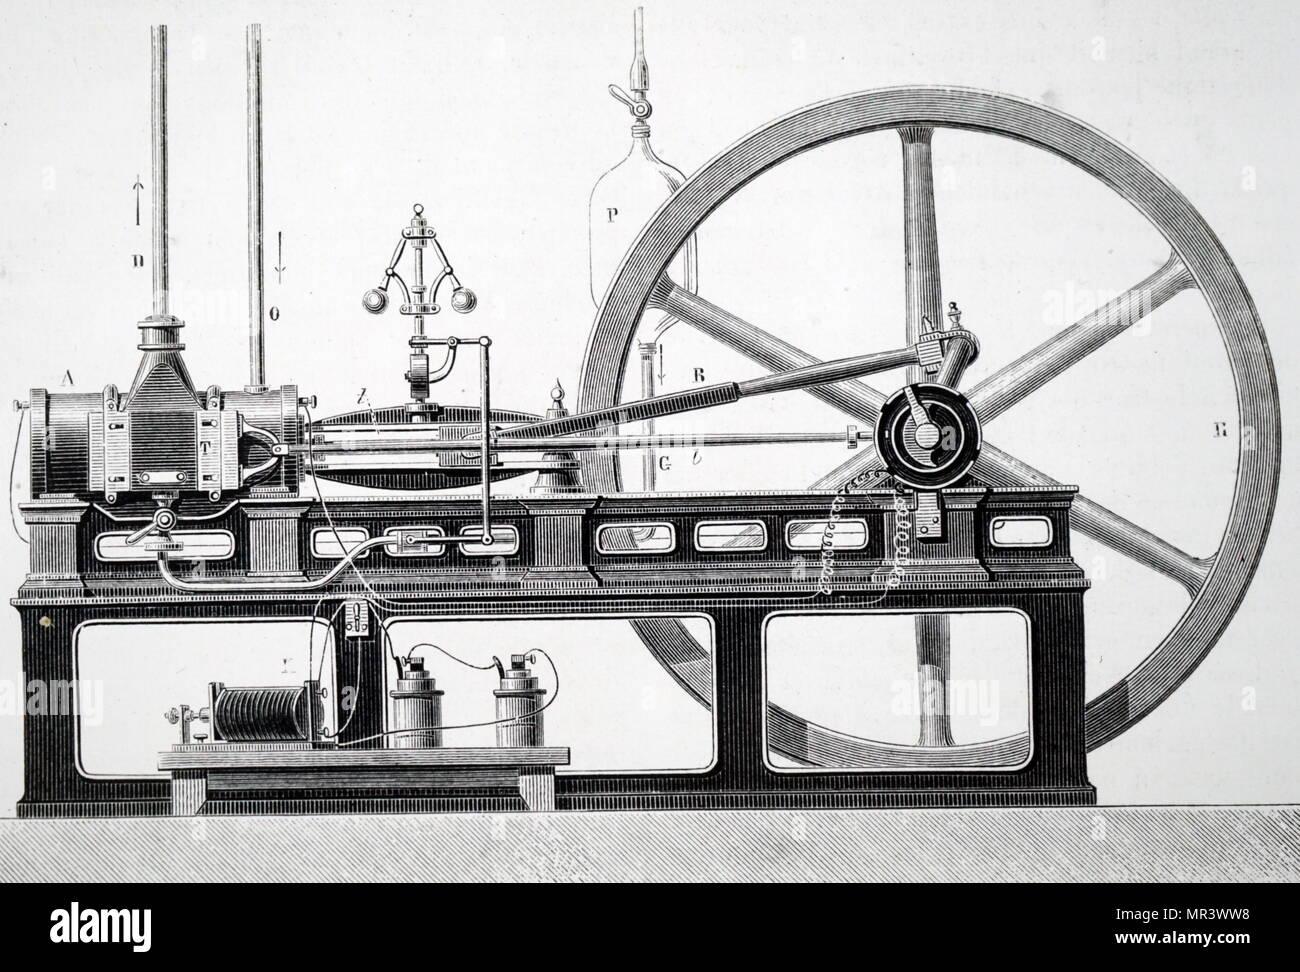 Illustration depicting the original  'Lenoir' gas engine. Dated 19th century - Stock Image